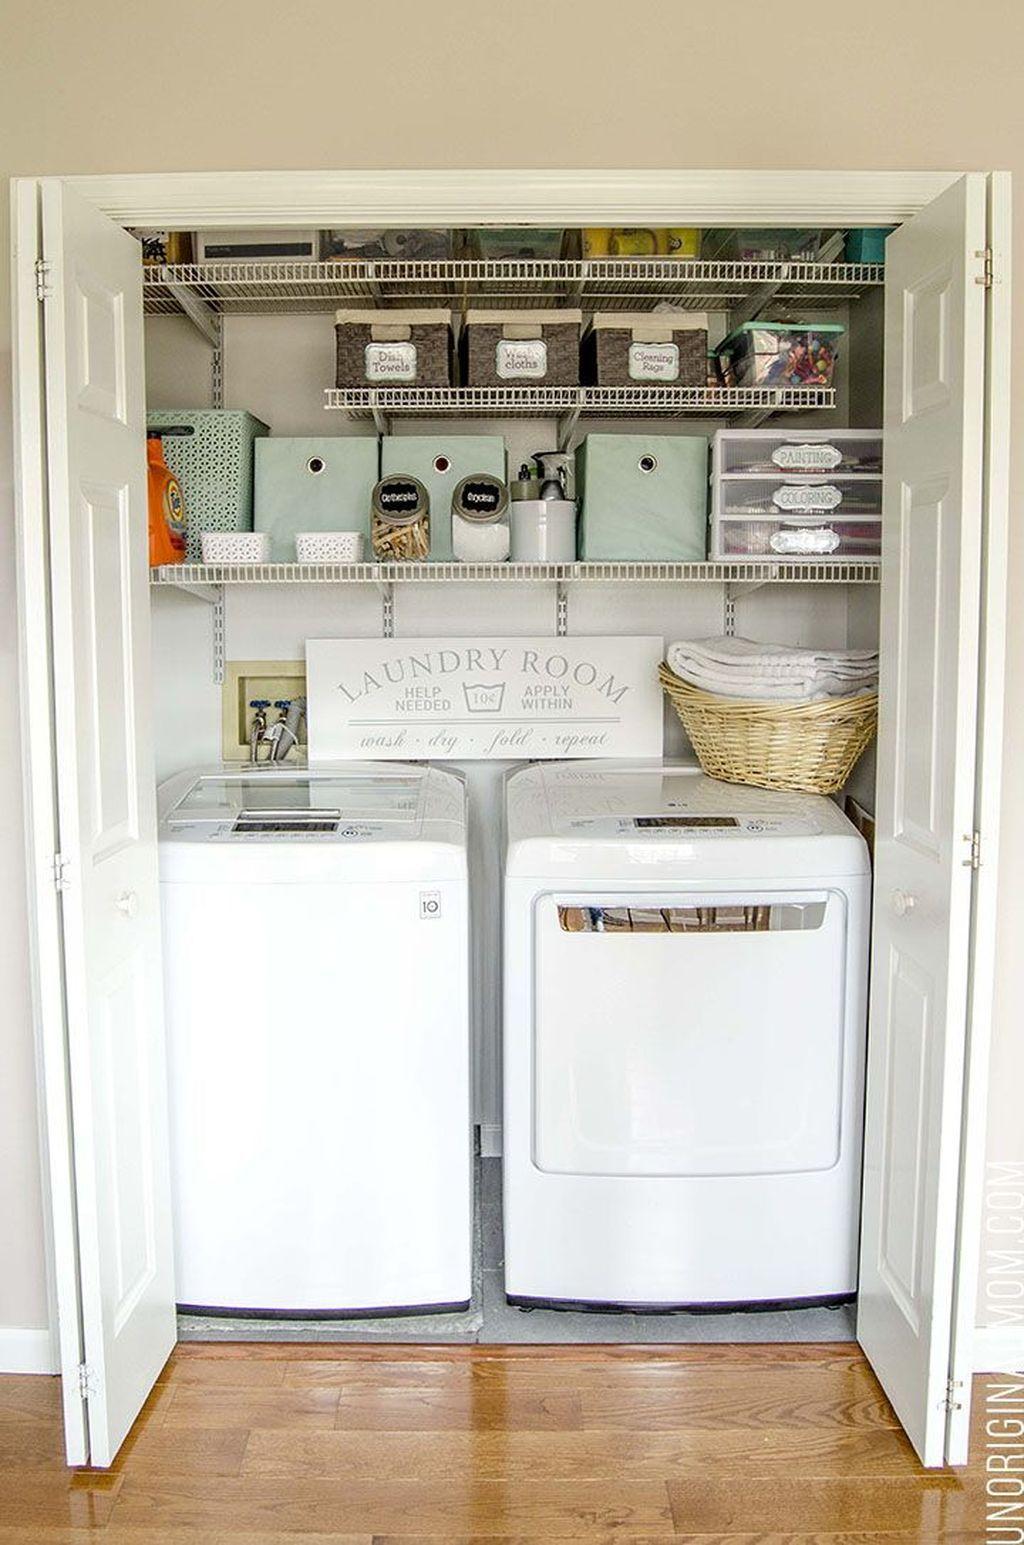 Nice 48 Diy Fabulous Closet Organizing Ideas Projects More At Https Homishome Com 20 Laundry Closet Makeover Laundry Closet Organization Laundry Room Closet